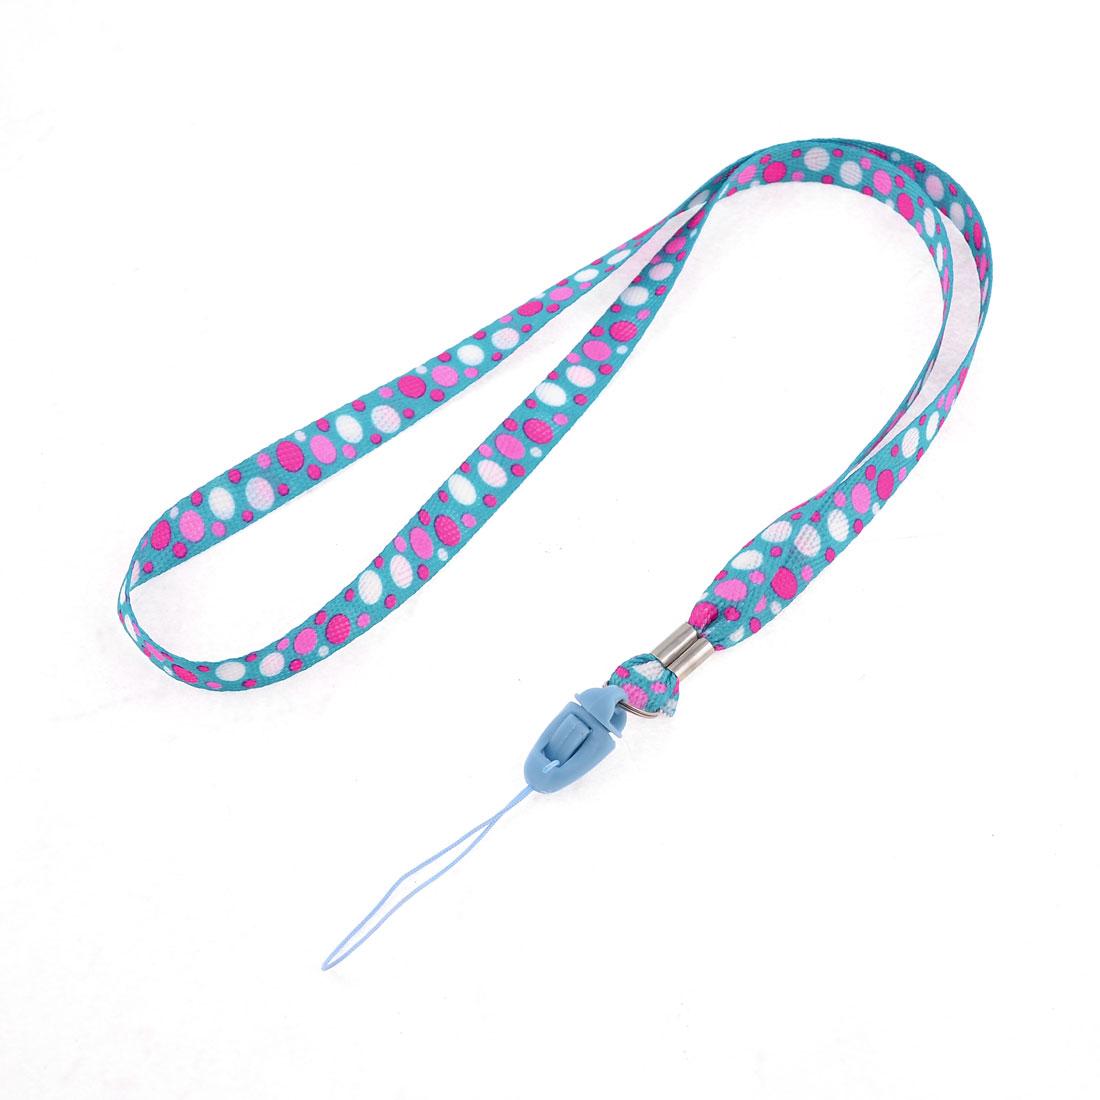 "16.5"" Long Colorful Dot Pattern Nylon Neck Lanyard"